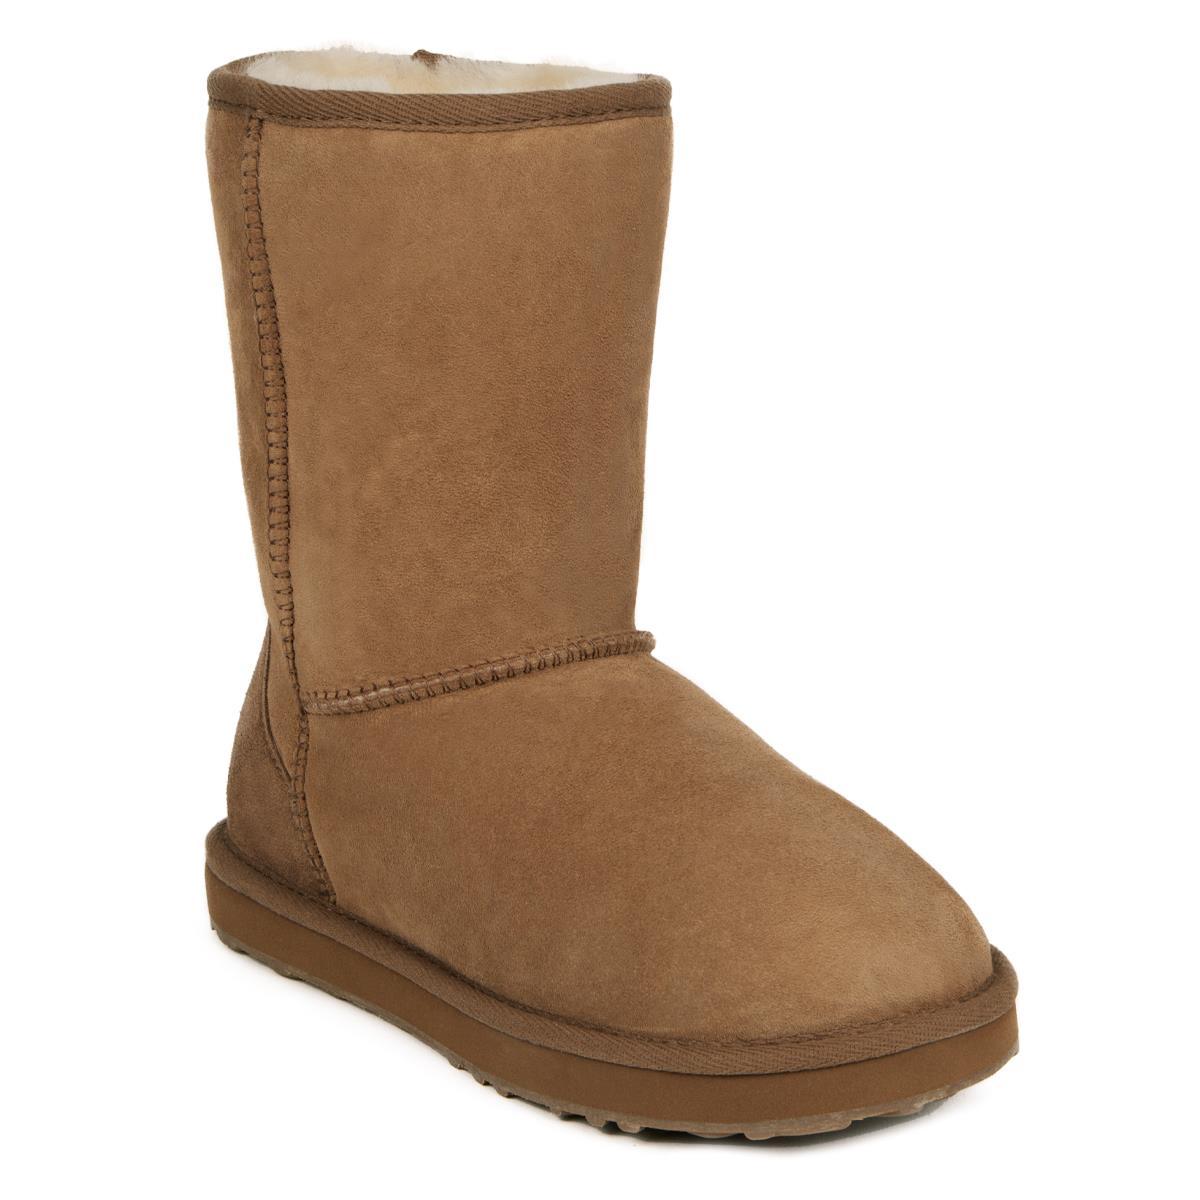 Ladies Short Classic Sheepskin Boots Just Sheepskin